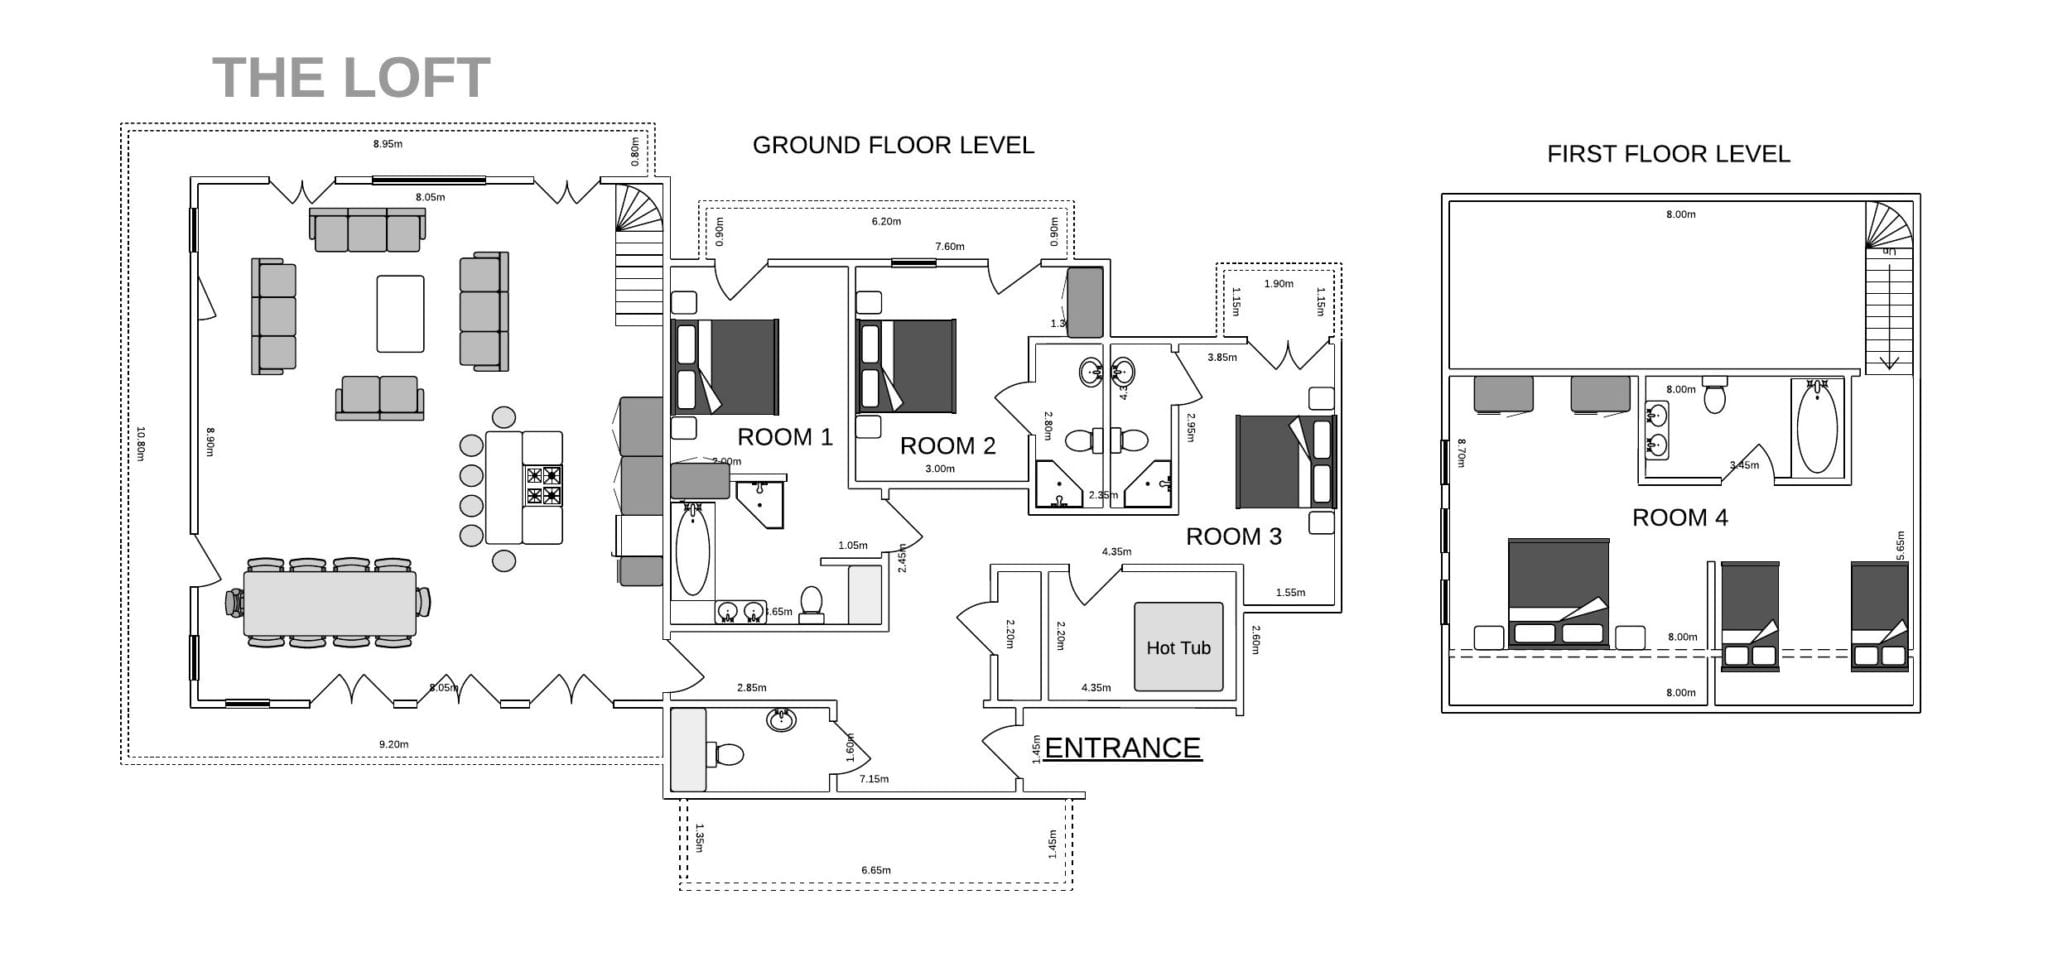 The Loft Courchevel 1650 Moriond floorplan